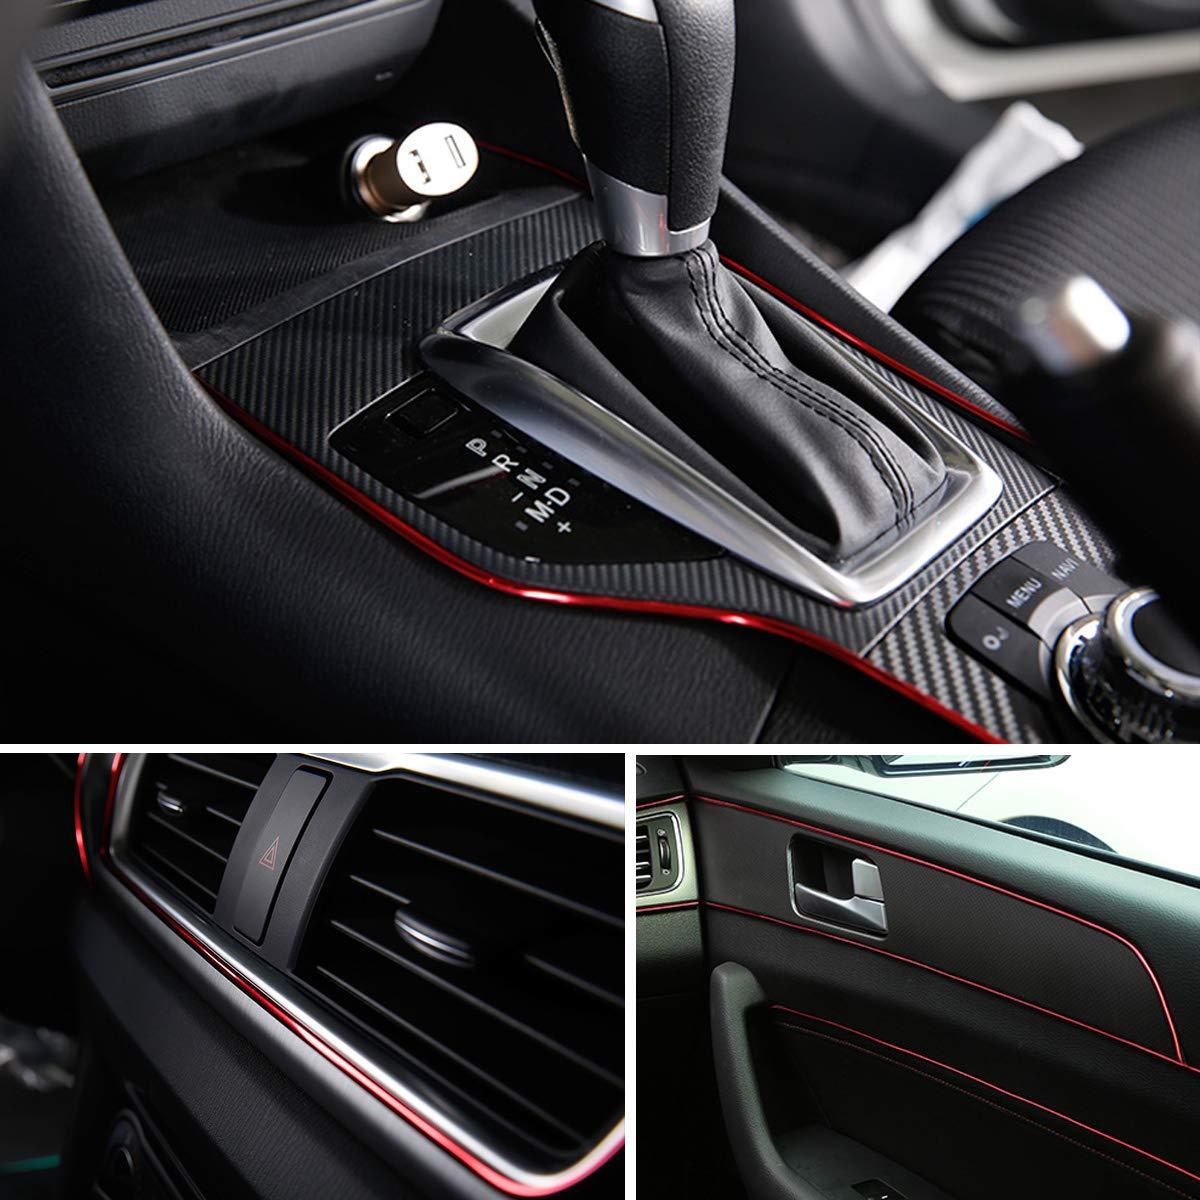 Electroplating Color Film Car Interior Exterior Decoration Moulding Trim Rubber Seal Protector Fit for Most Car Blue 16FT EJs SUPER CAR Car Interior Moulding Trim 5M